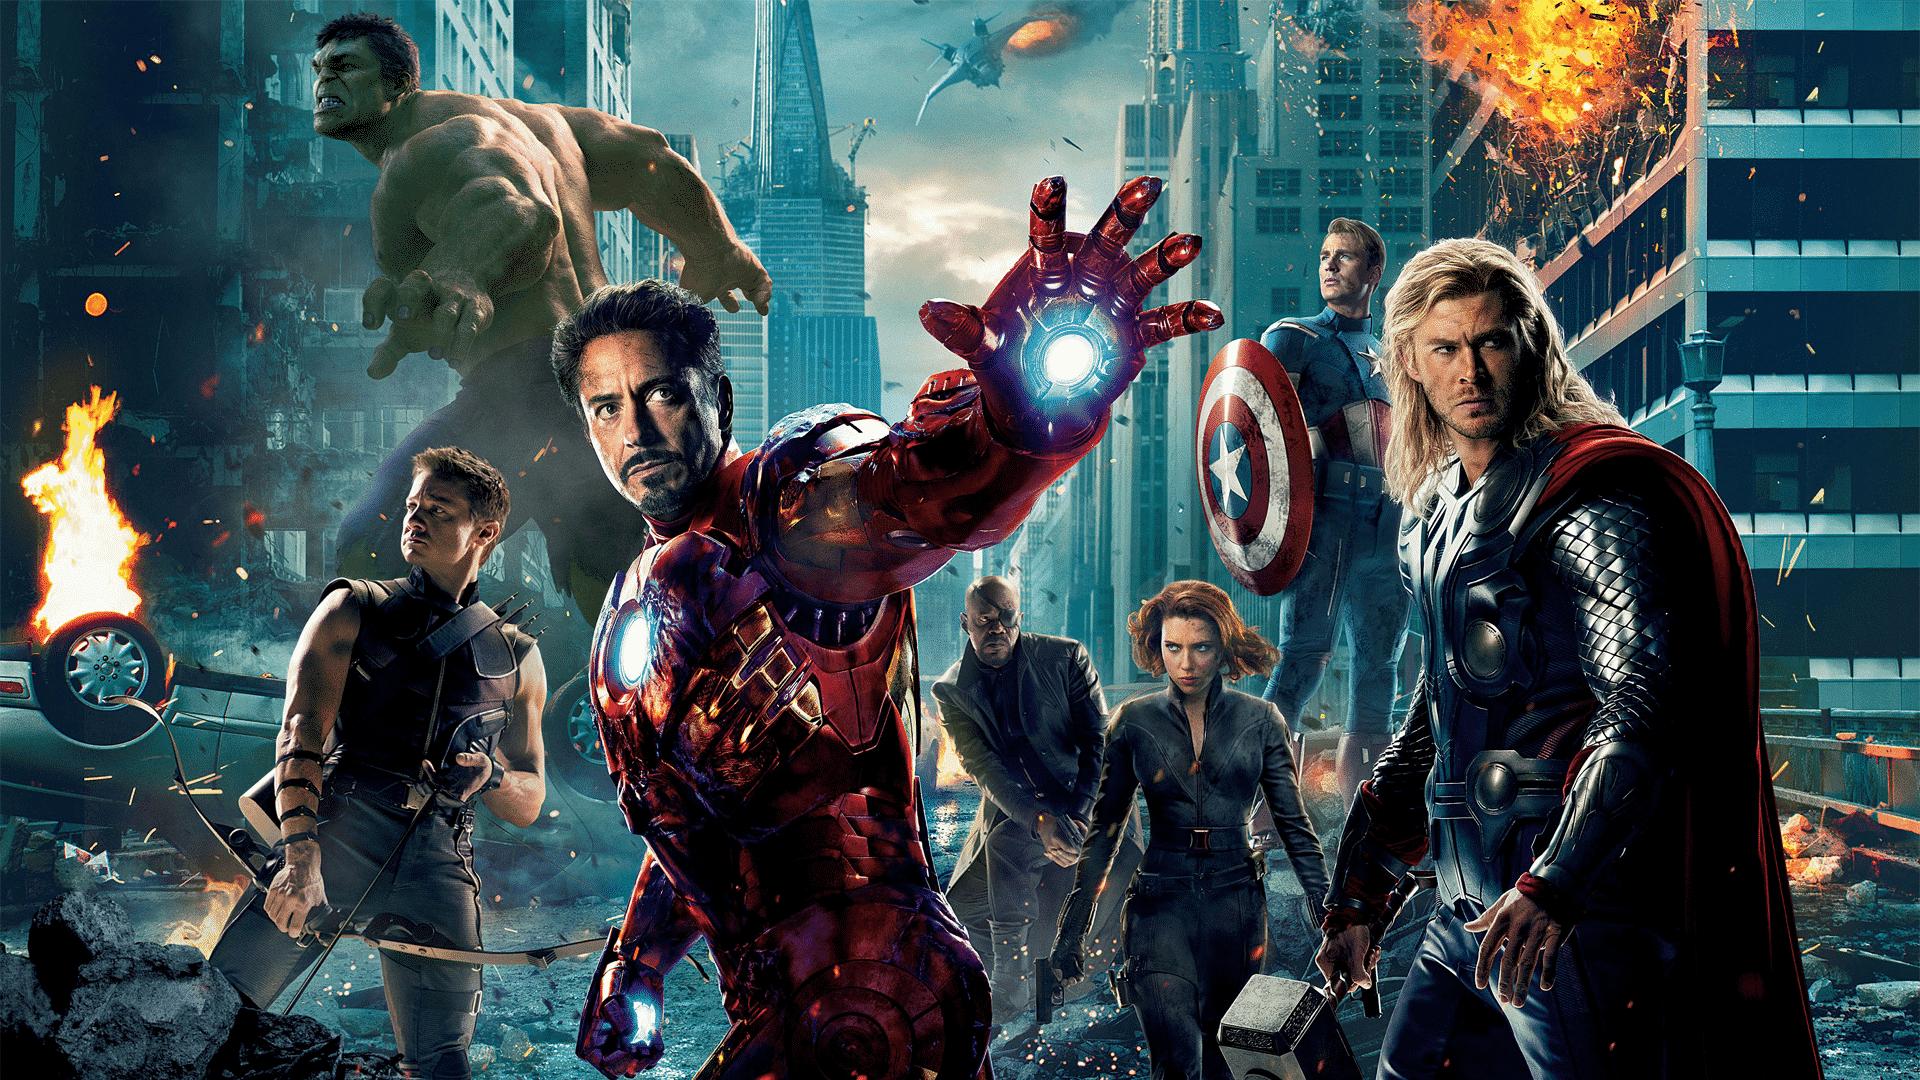 Vymazaná scéna z filmu The Avengers